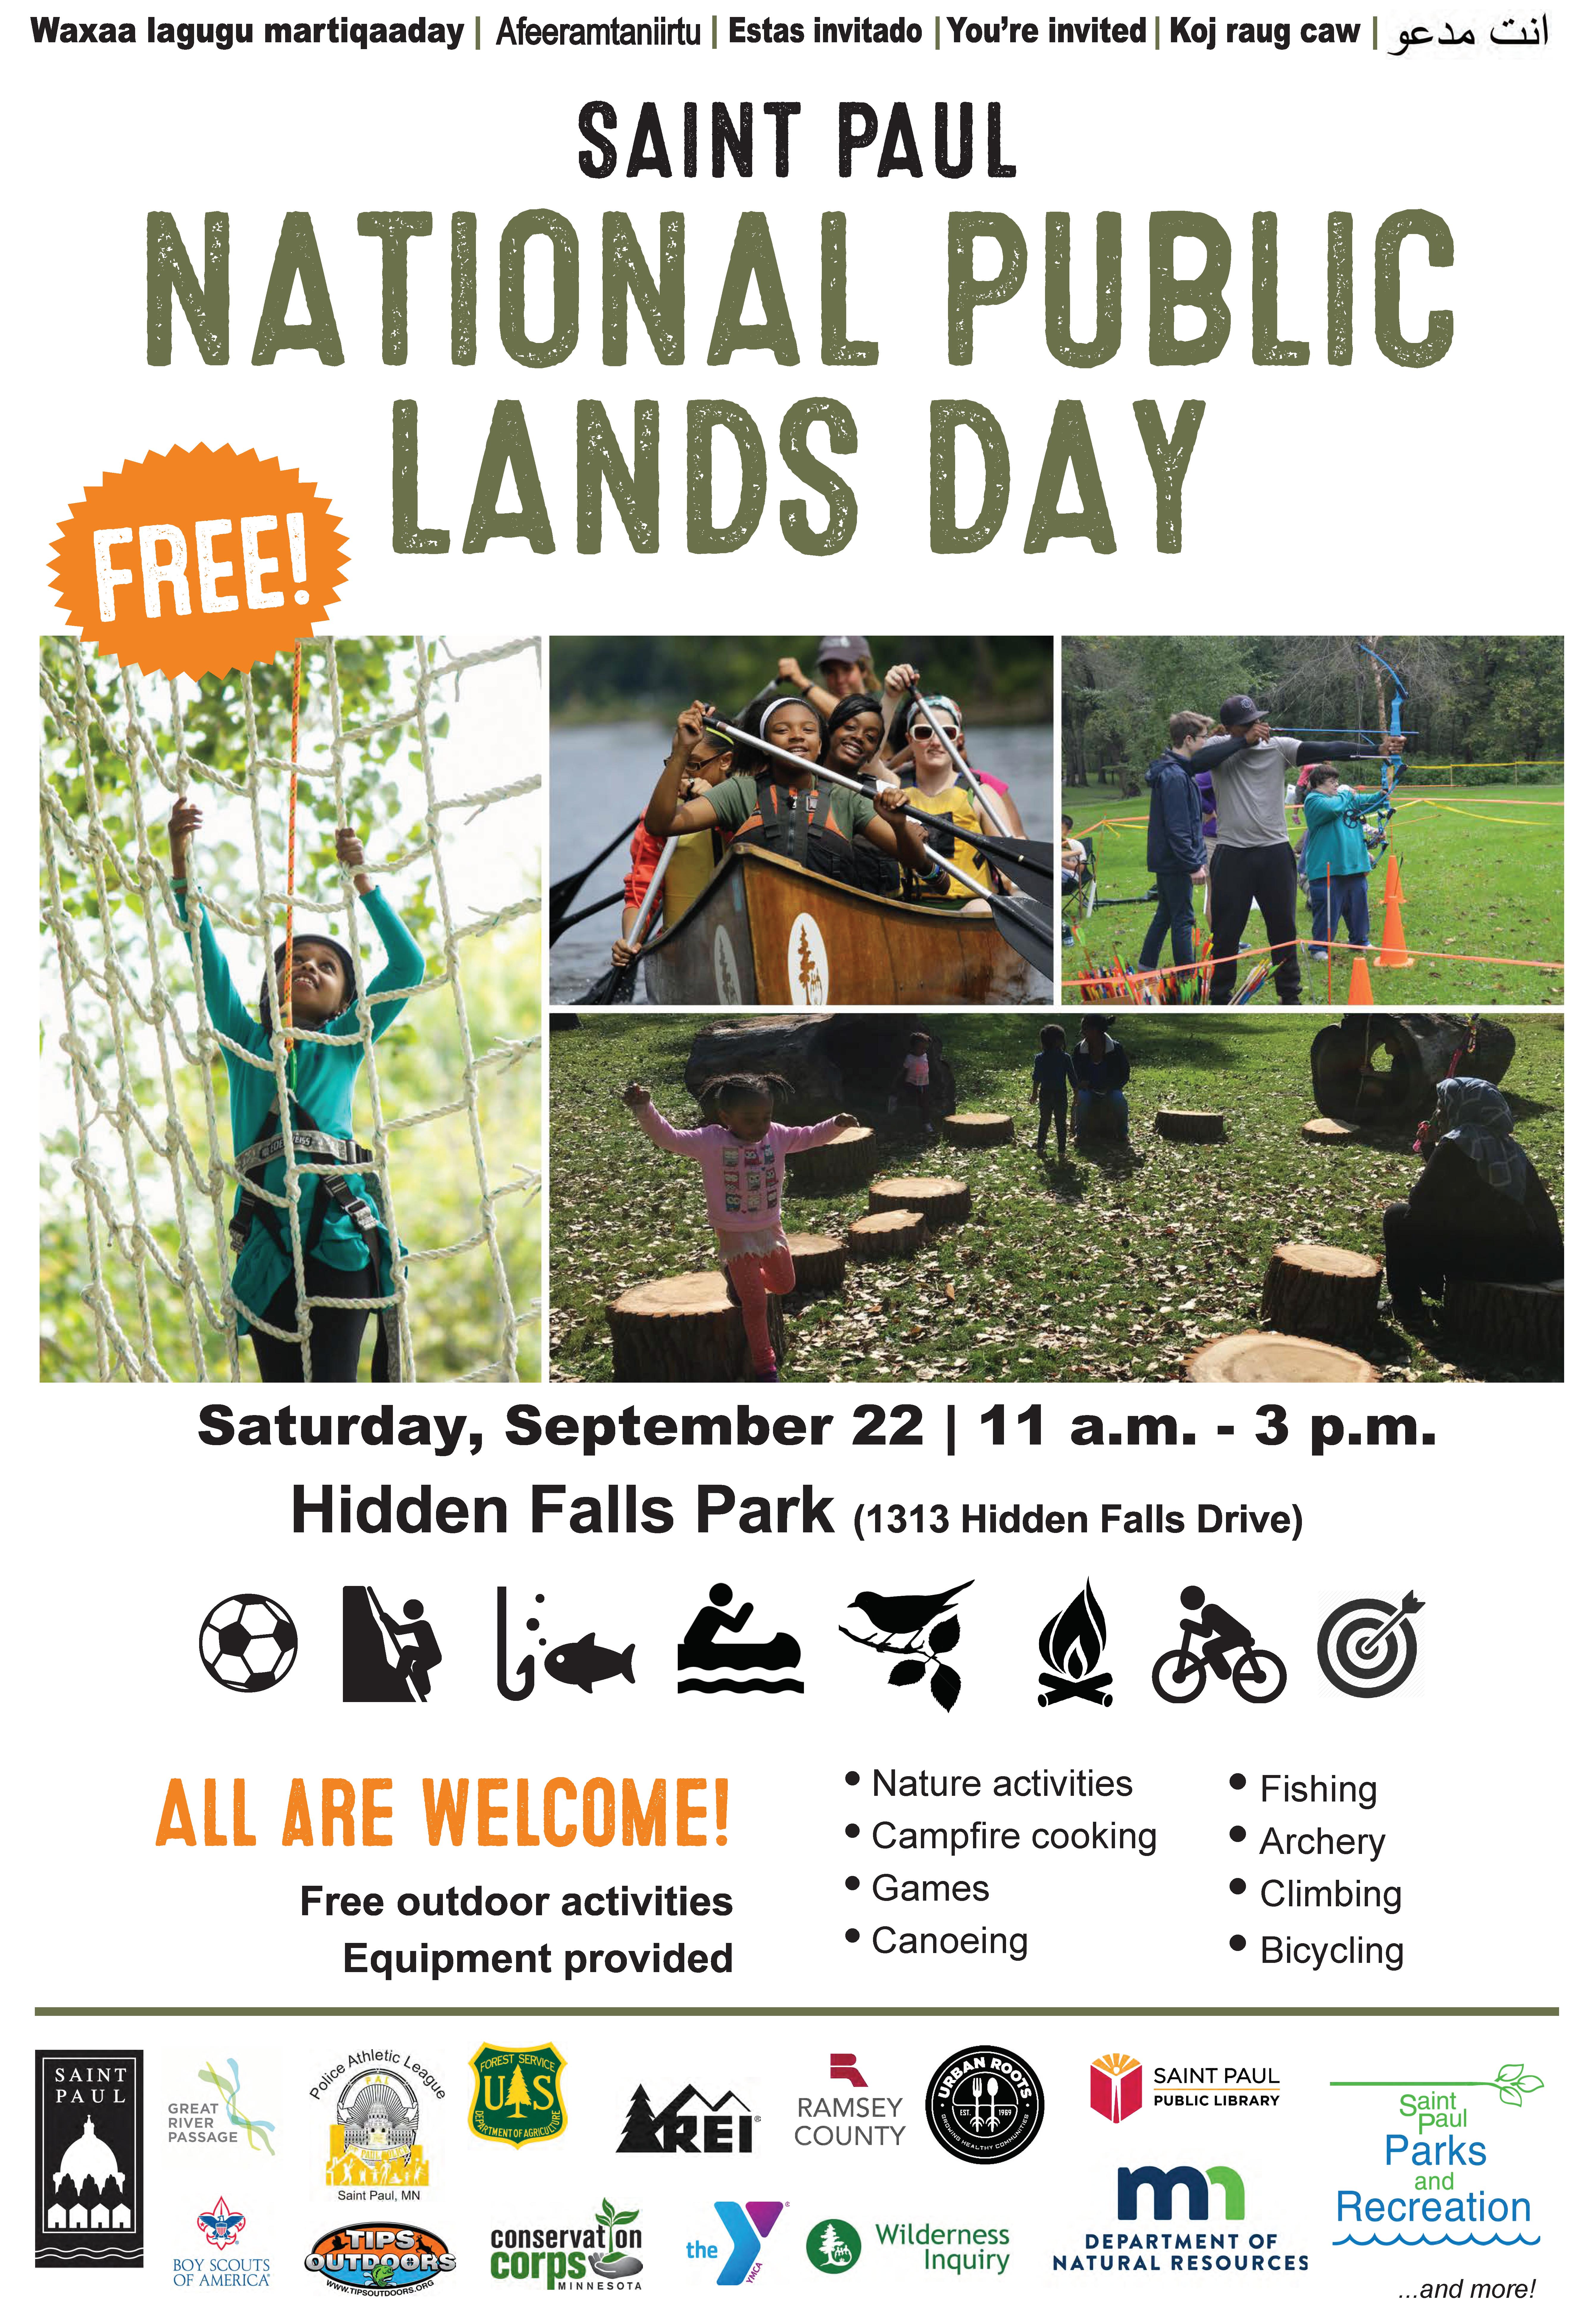 National Public Lands Day 2018 Flyer.png